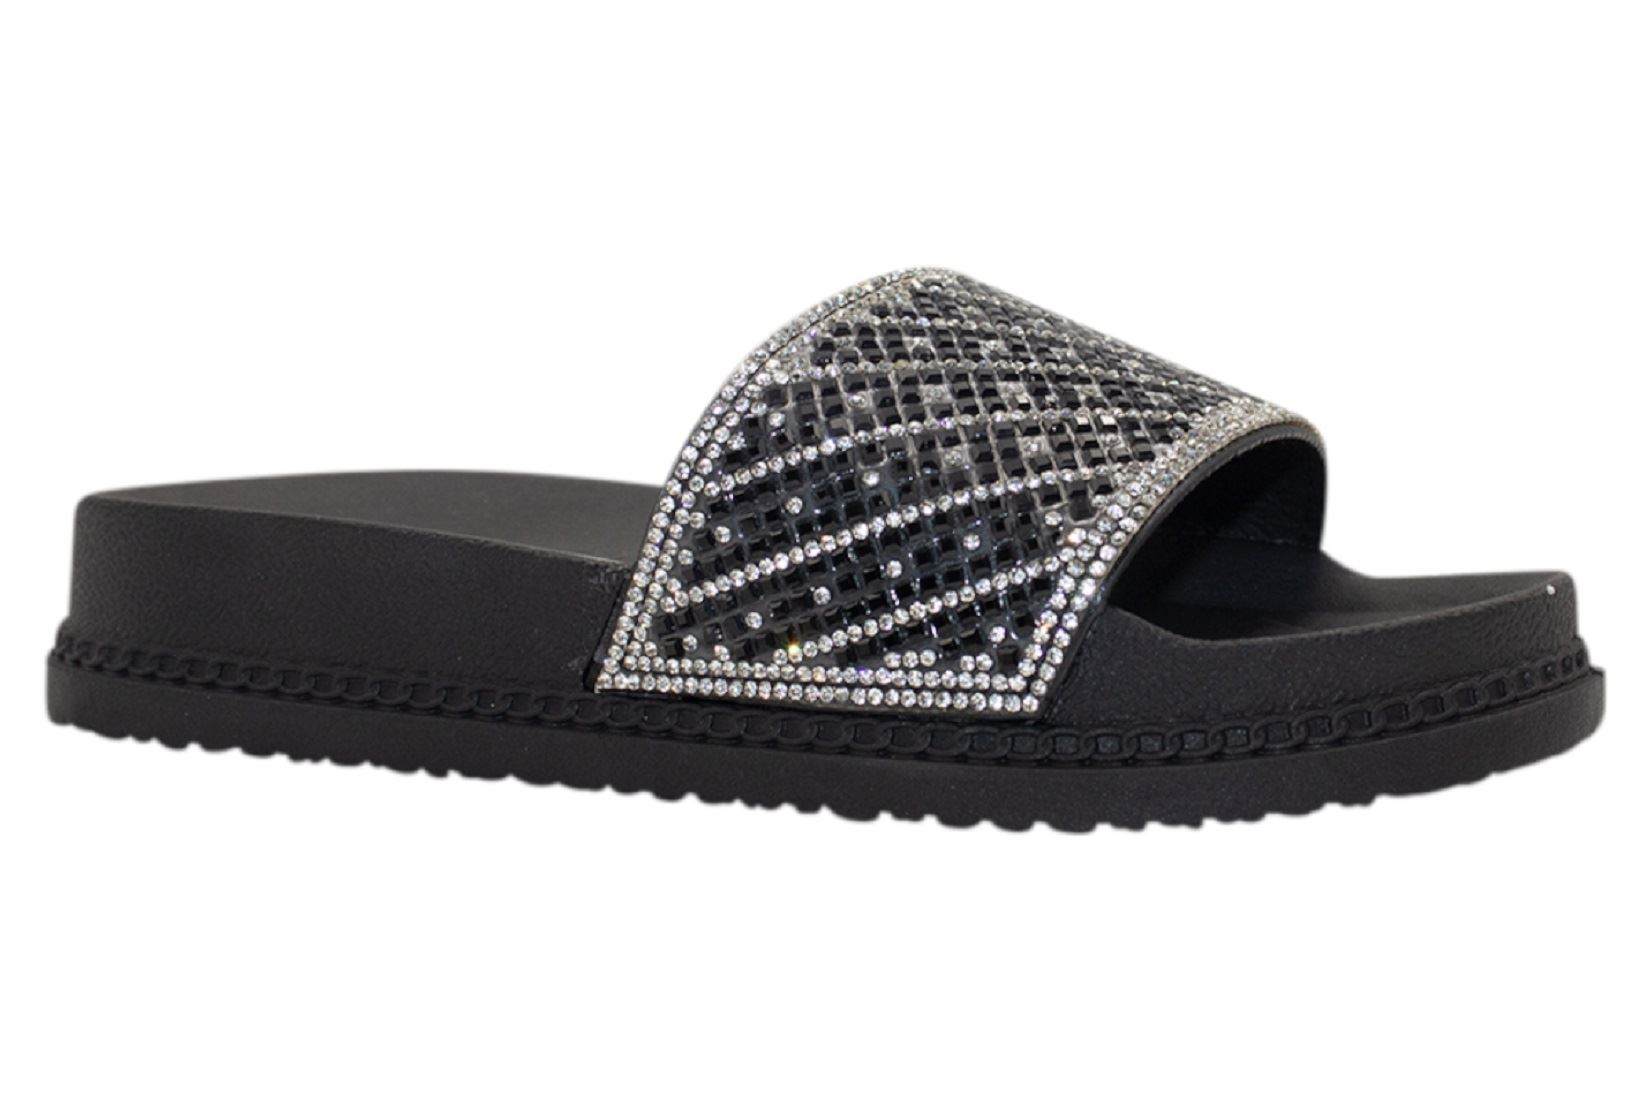 Womens-Sliders-Casual-Slippers-Mules-Ladies-Diamante-Flip-Flop-Sandals-Shoes thumbnail 23